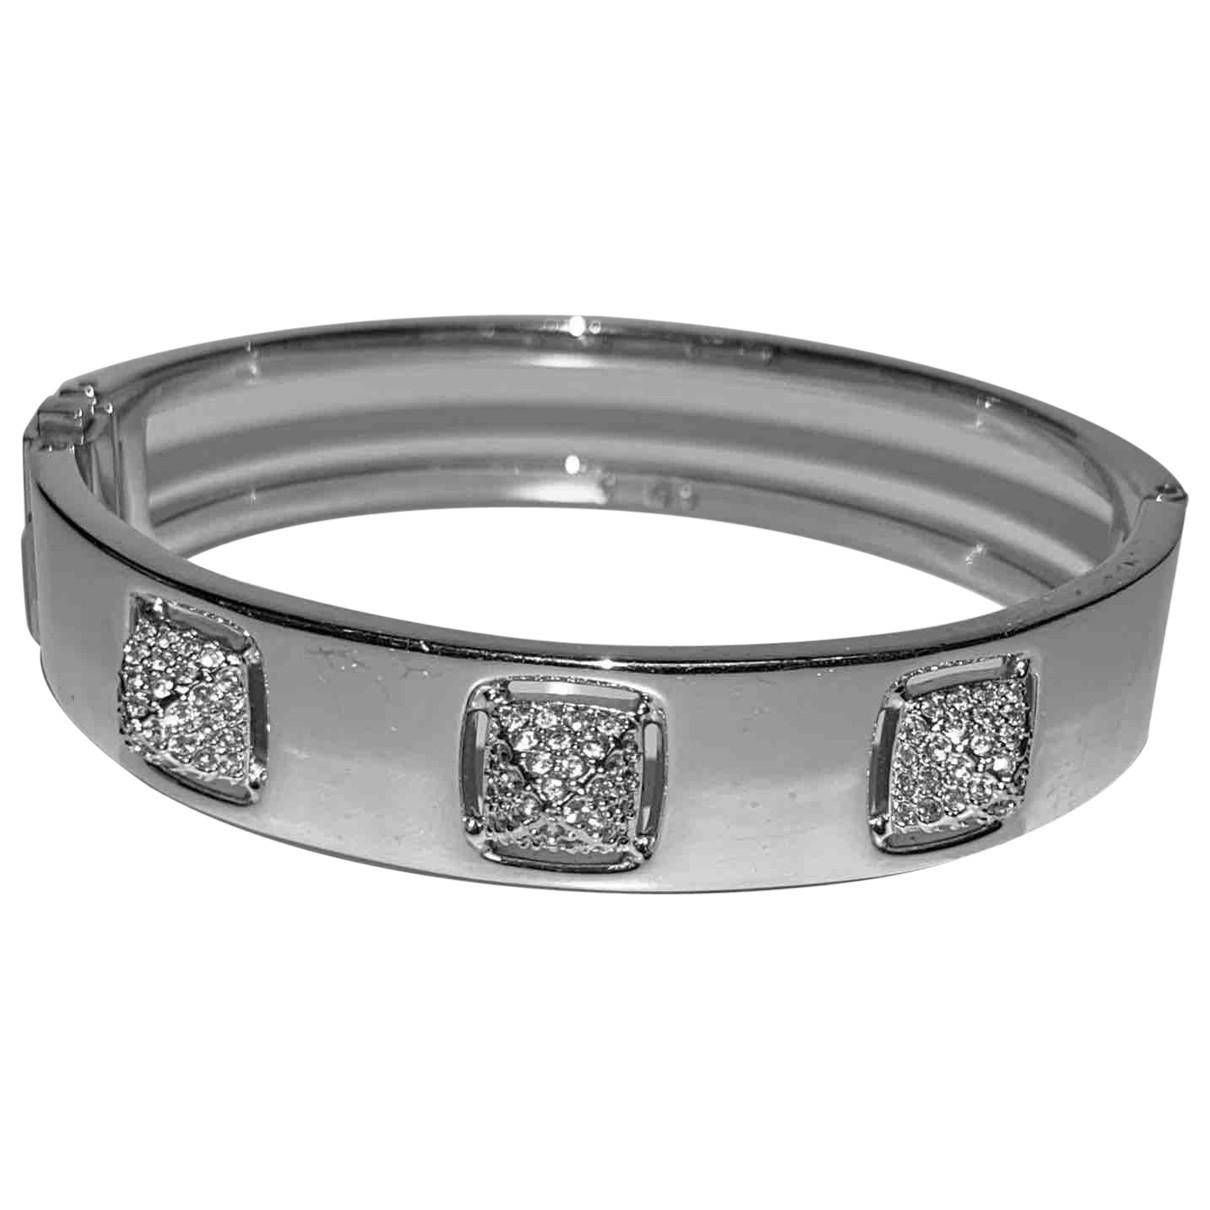 Swarovski Atelier - Bracelet   pour femme en metal - argente